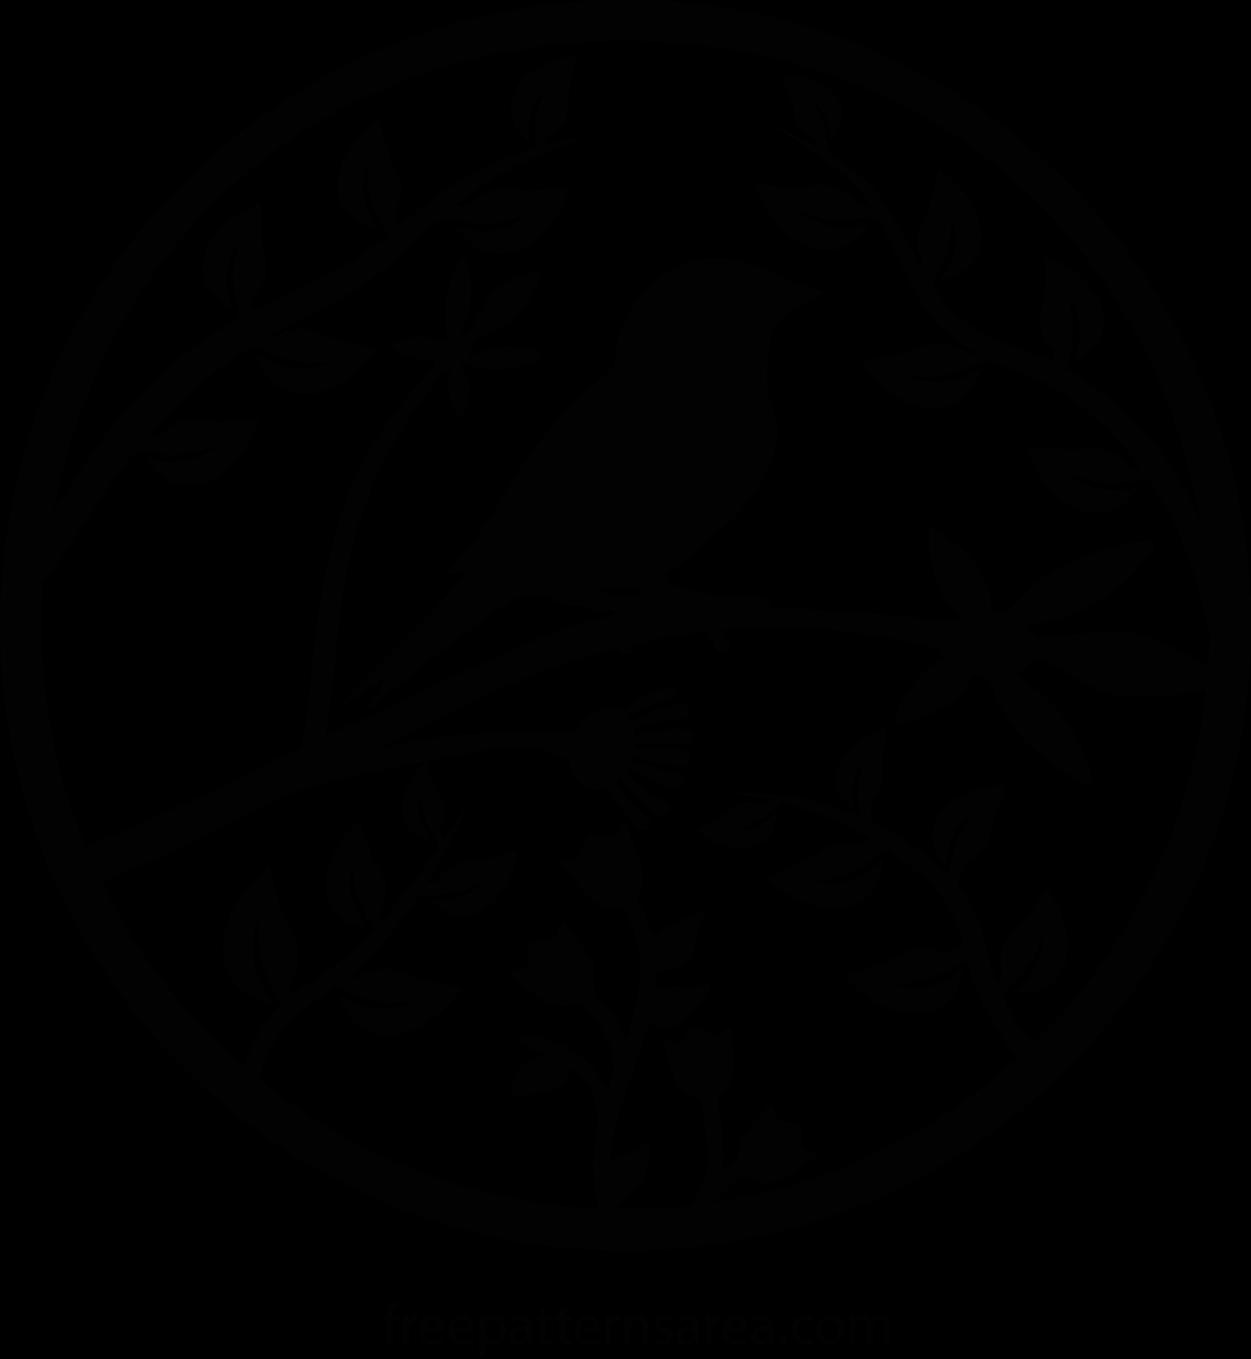 printable bird template - Bird Template